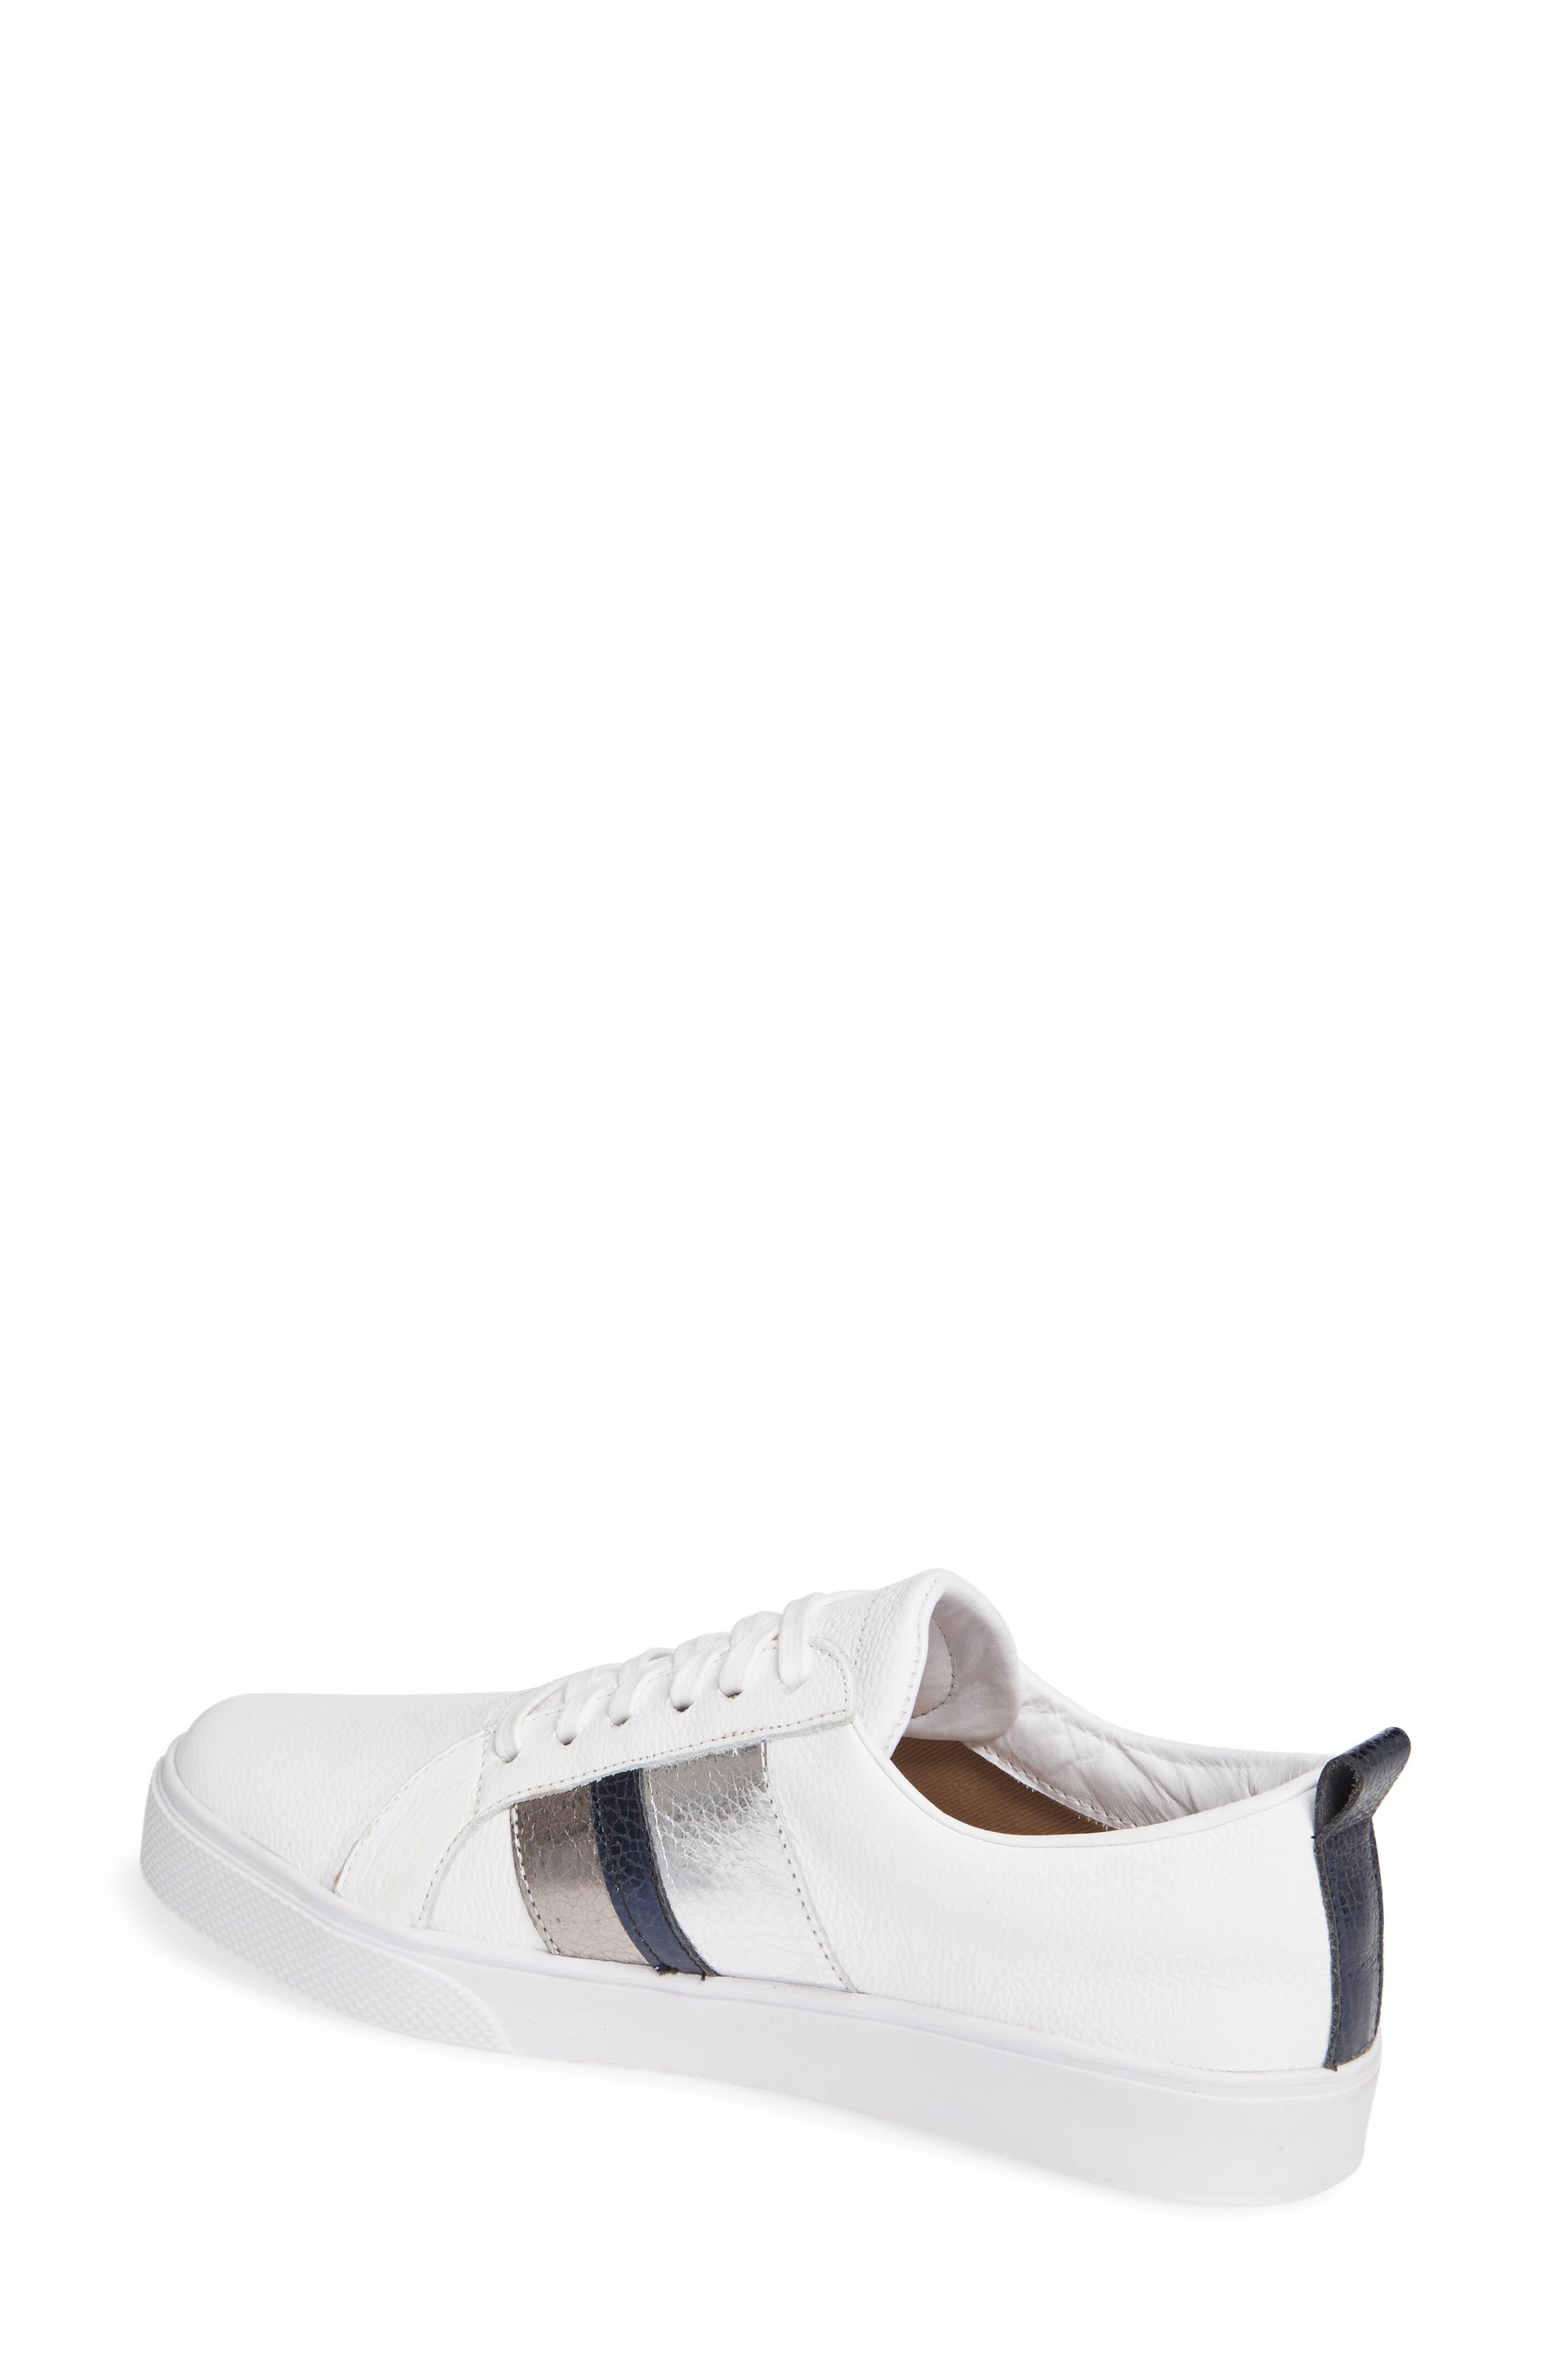 Bristol Sneaker,                             Alternate thumbnail 2, color,                             BLUE LEATHER